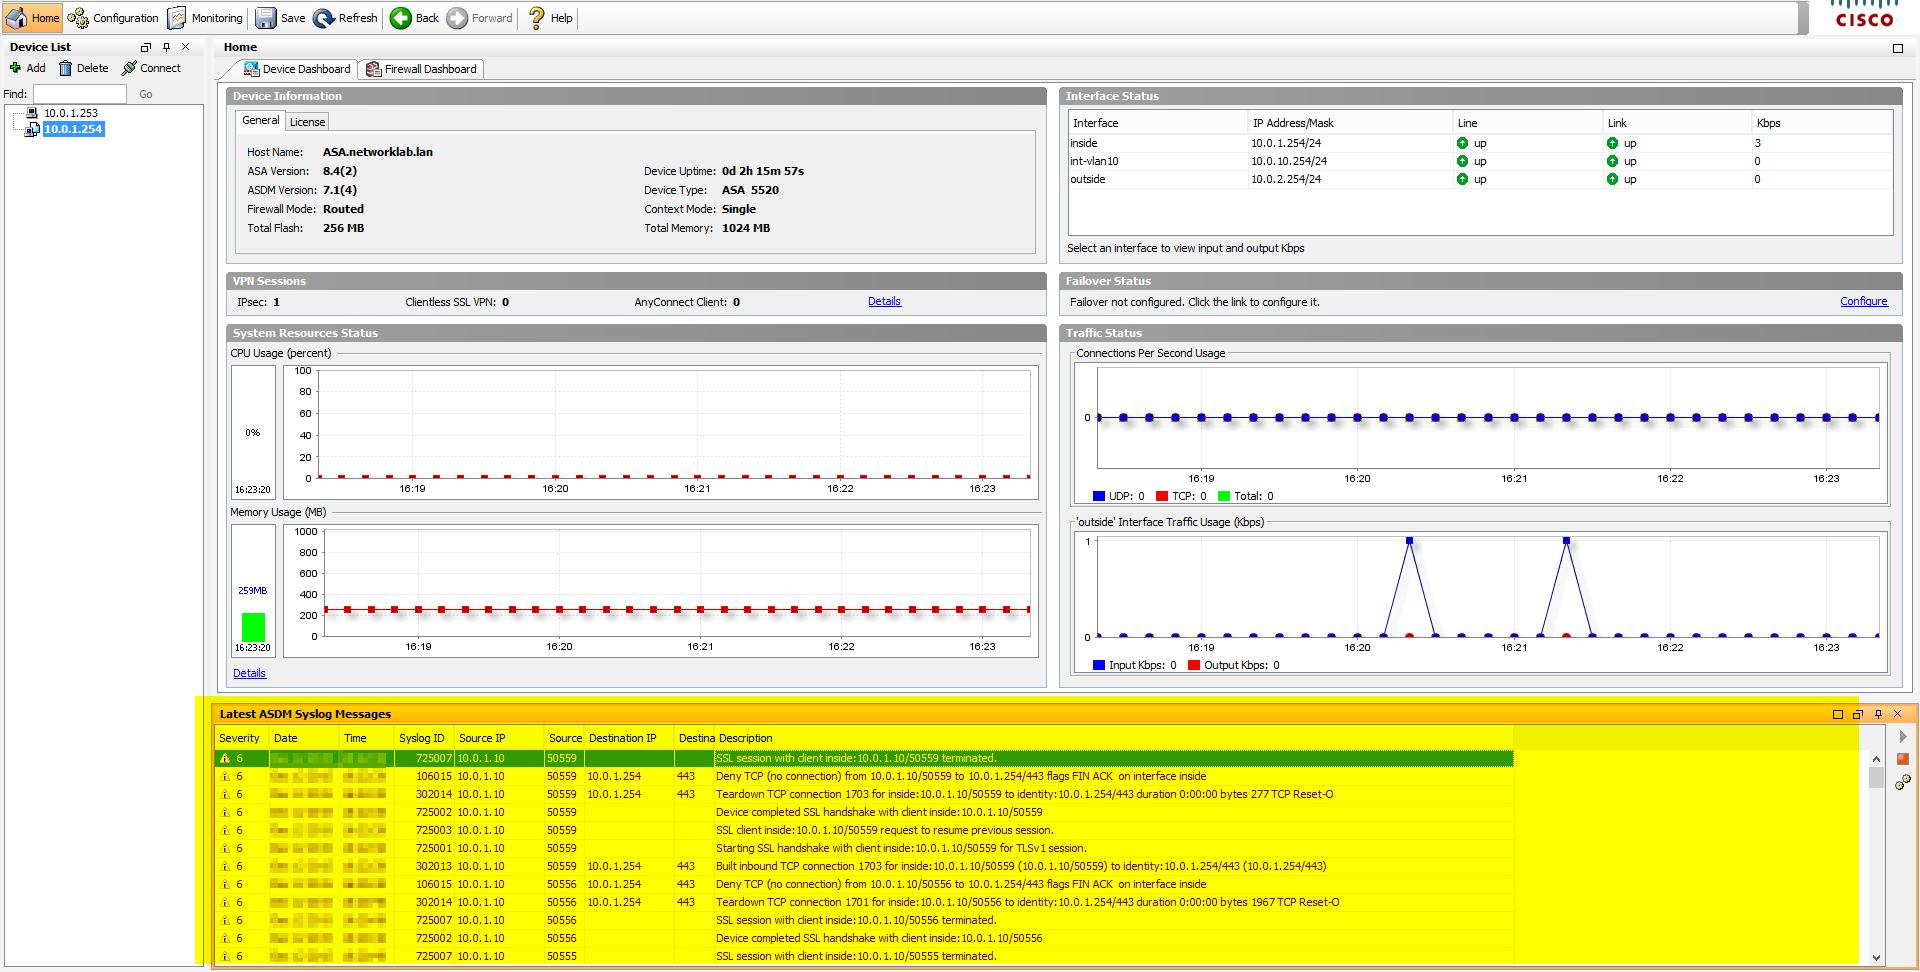 memo-cisco-asa-configuration-vpn-site-to-site-image-21